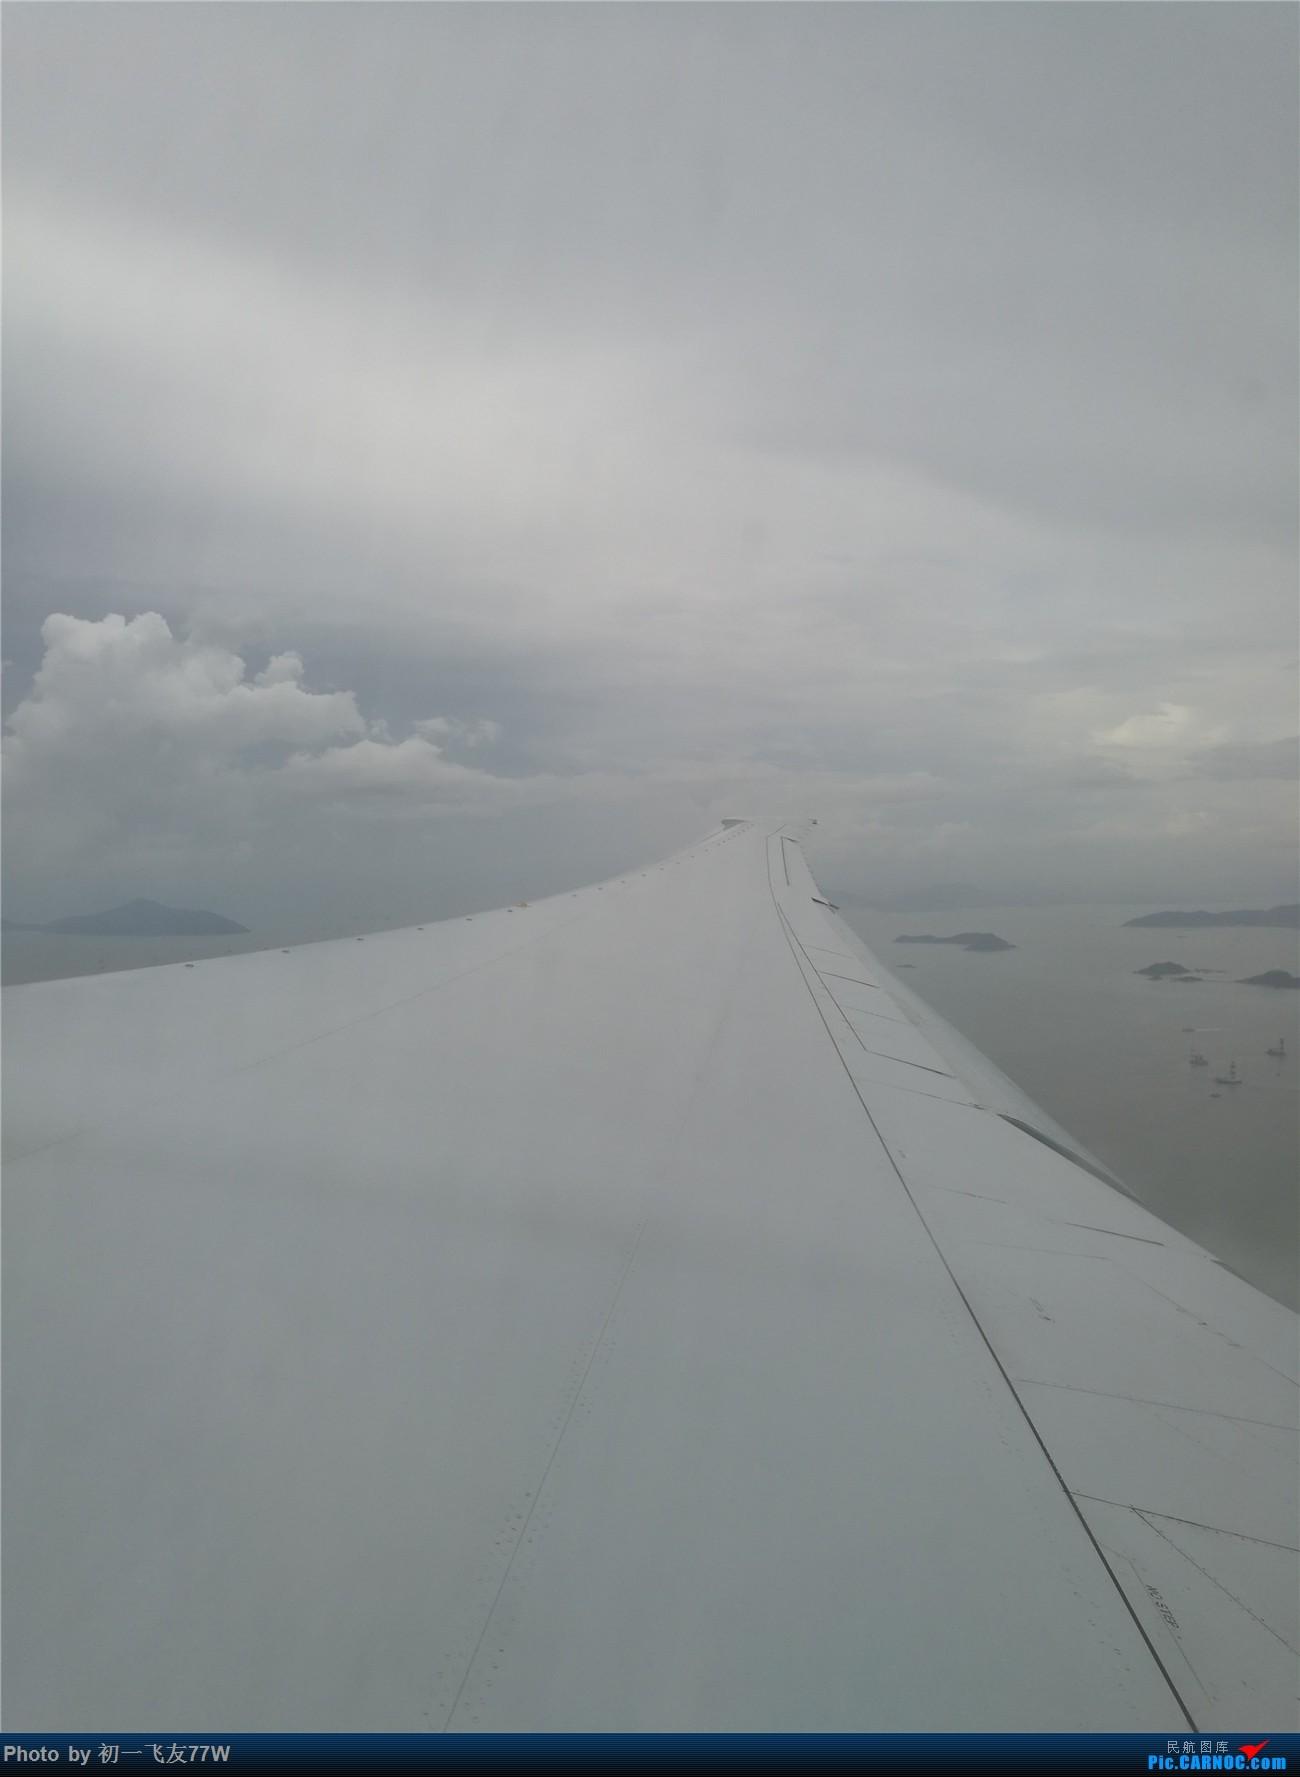 Re:[原创]香港到蒙特利尔,中转多伦多 BOEING 777-200LR